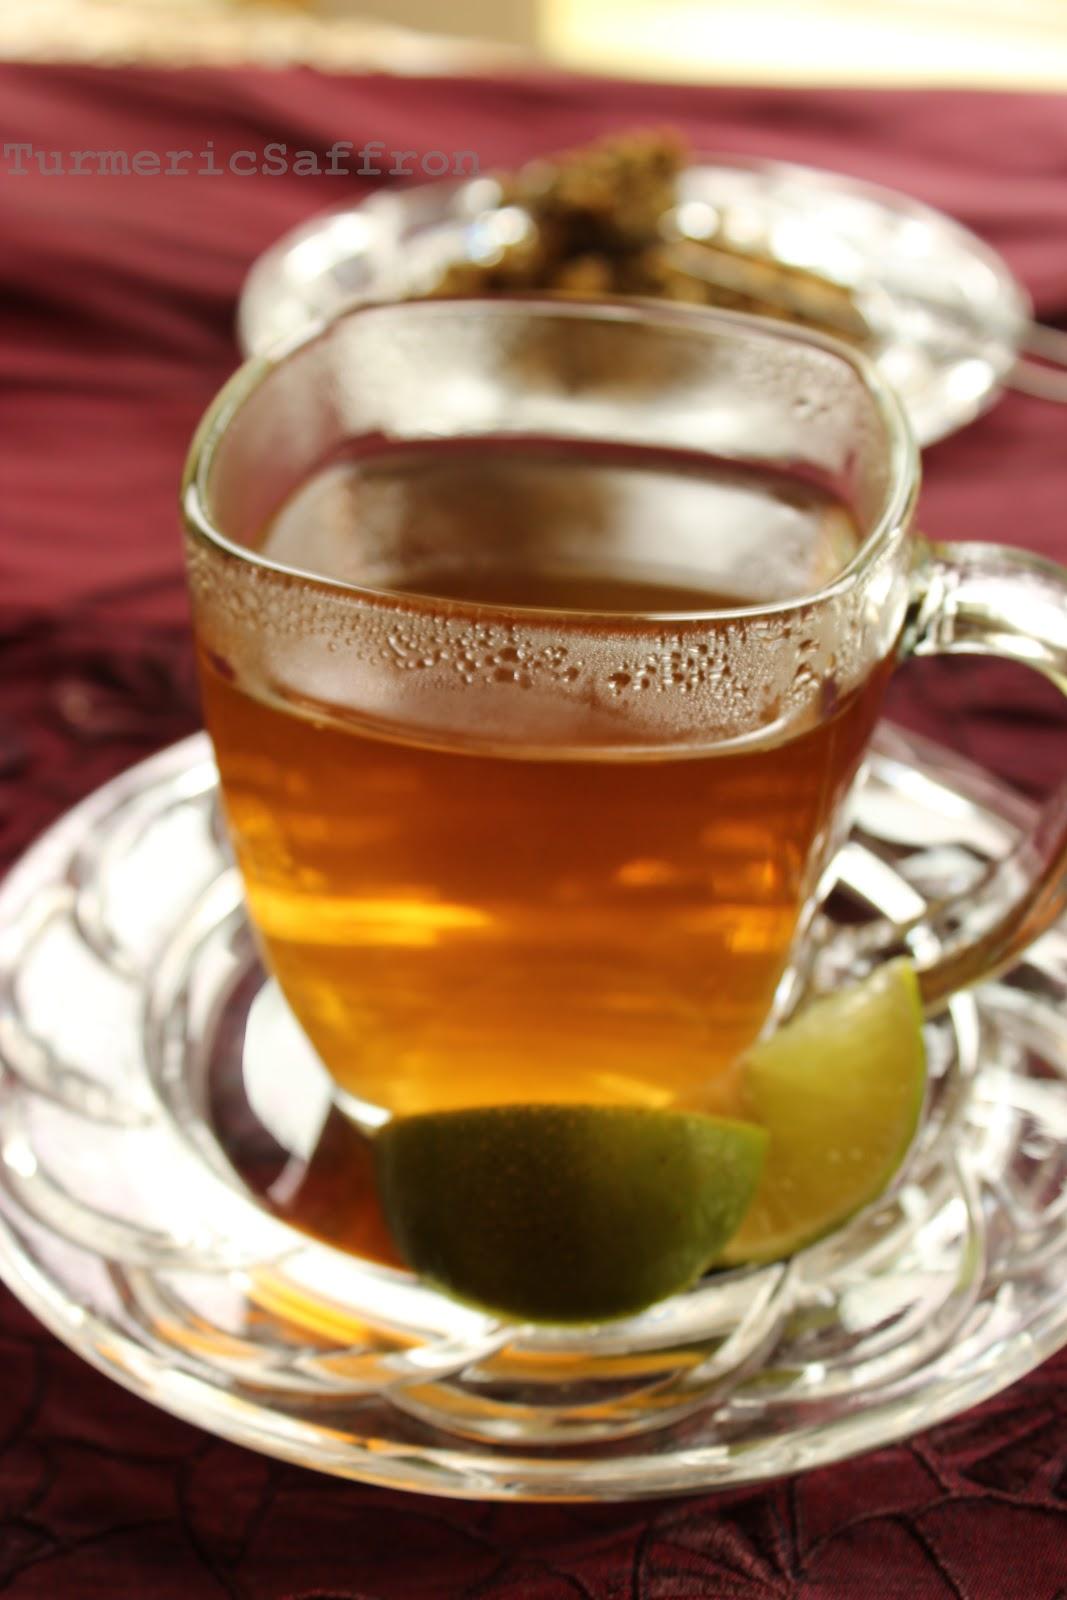 Turmeric & Saffron: Chai Babooneh - Chamomile Tea